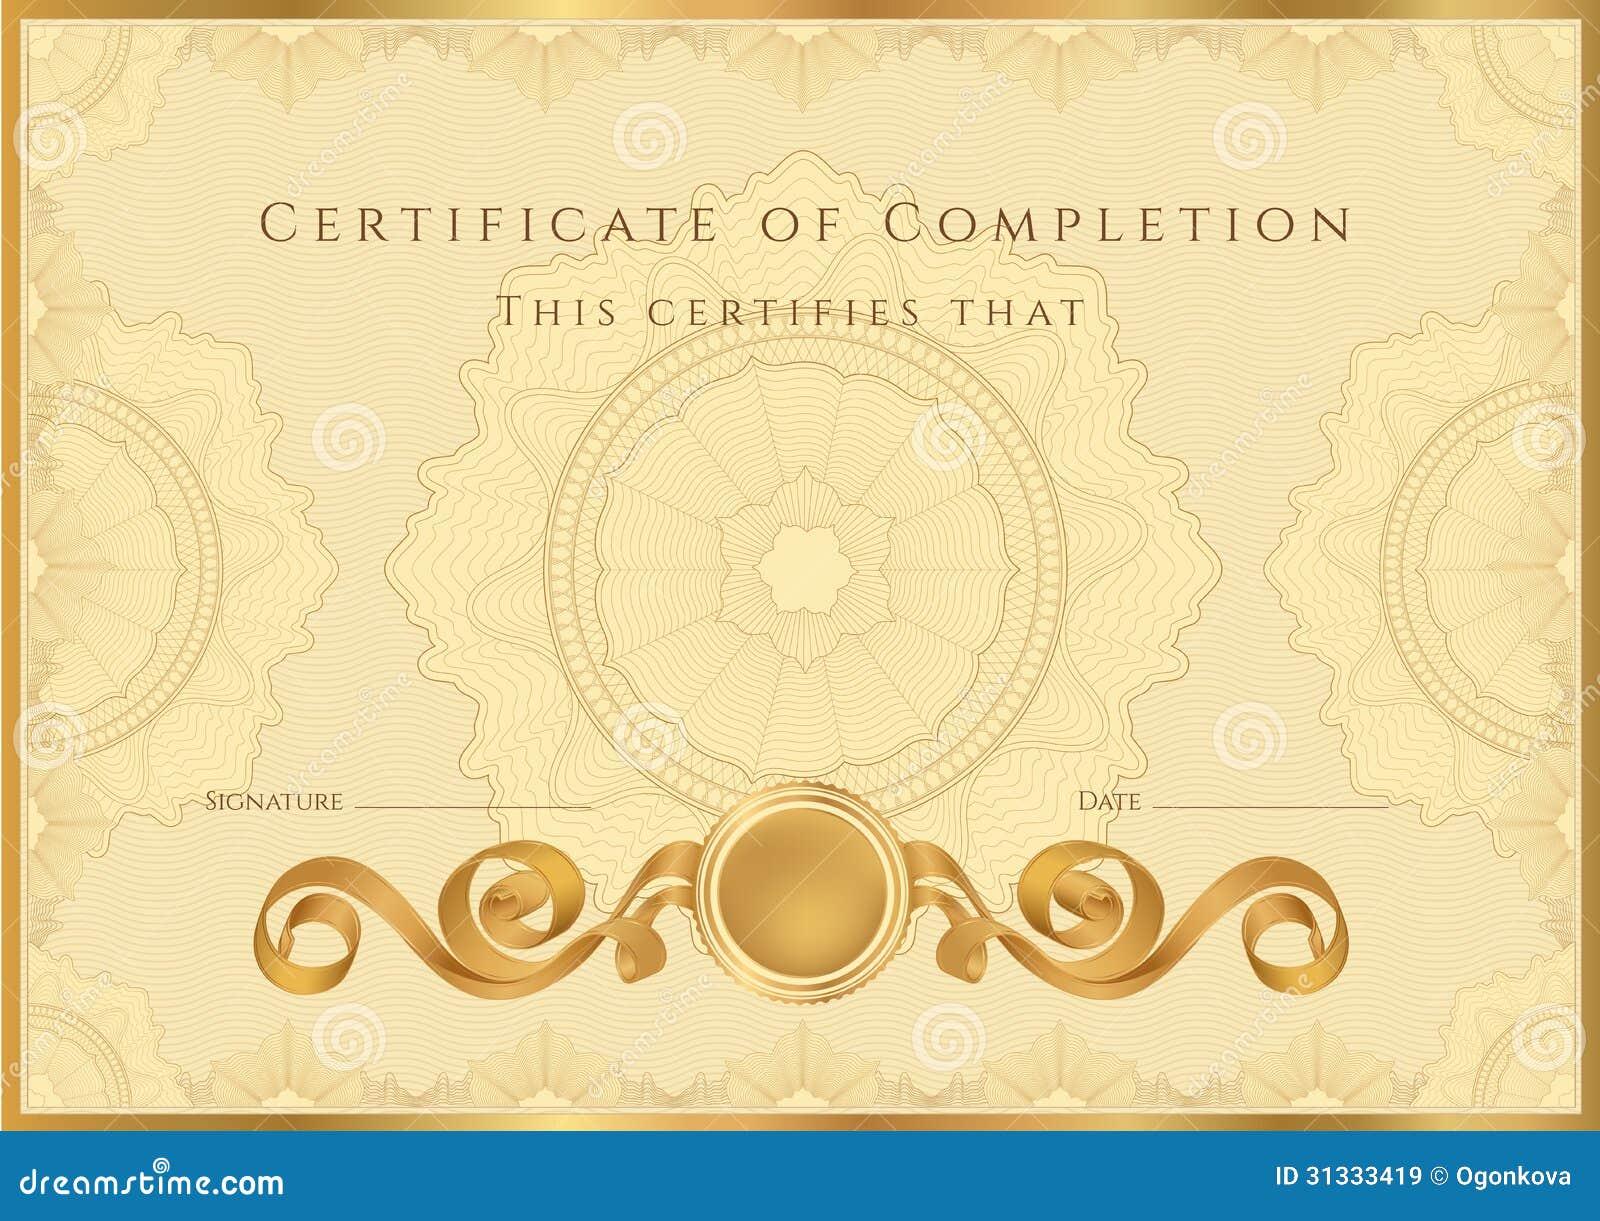 Zertifikat-/Diplomhintergrundschablone. Muster Vektor Abbildung ...